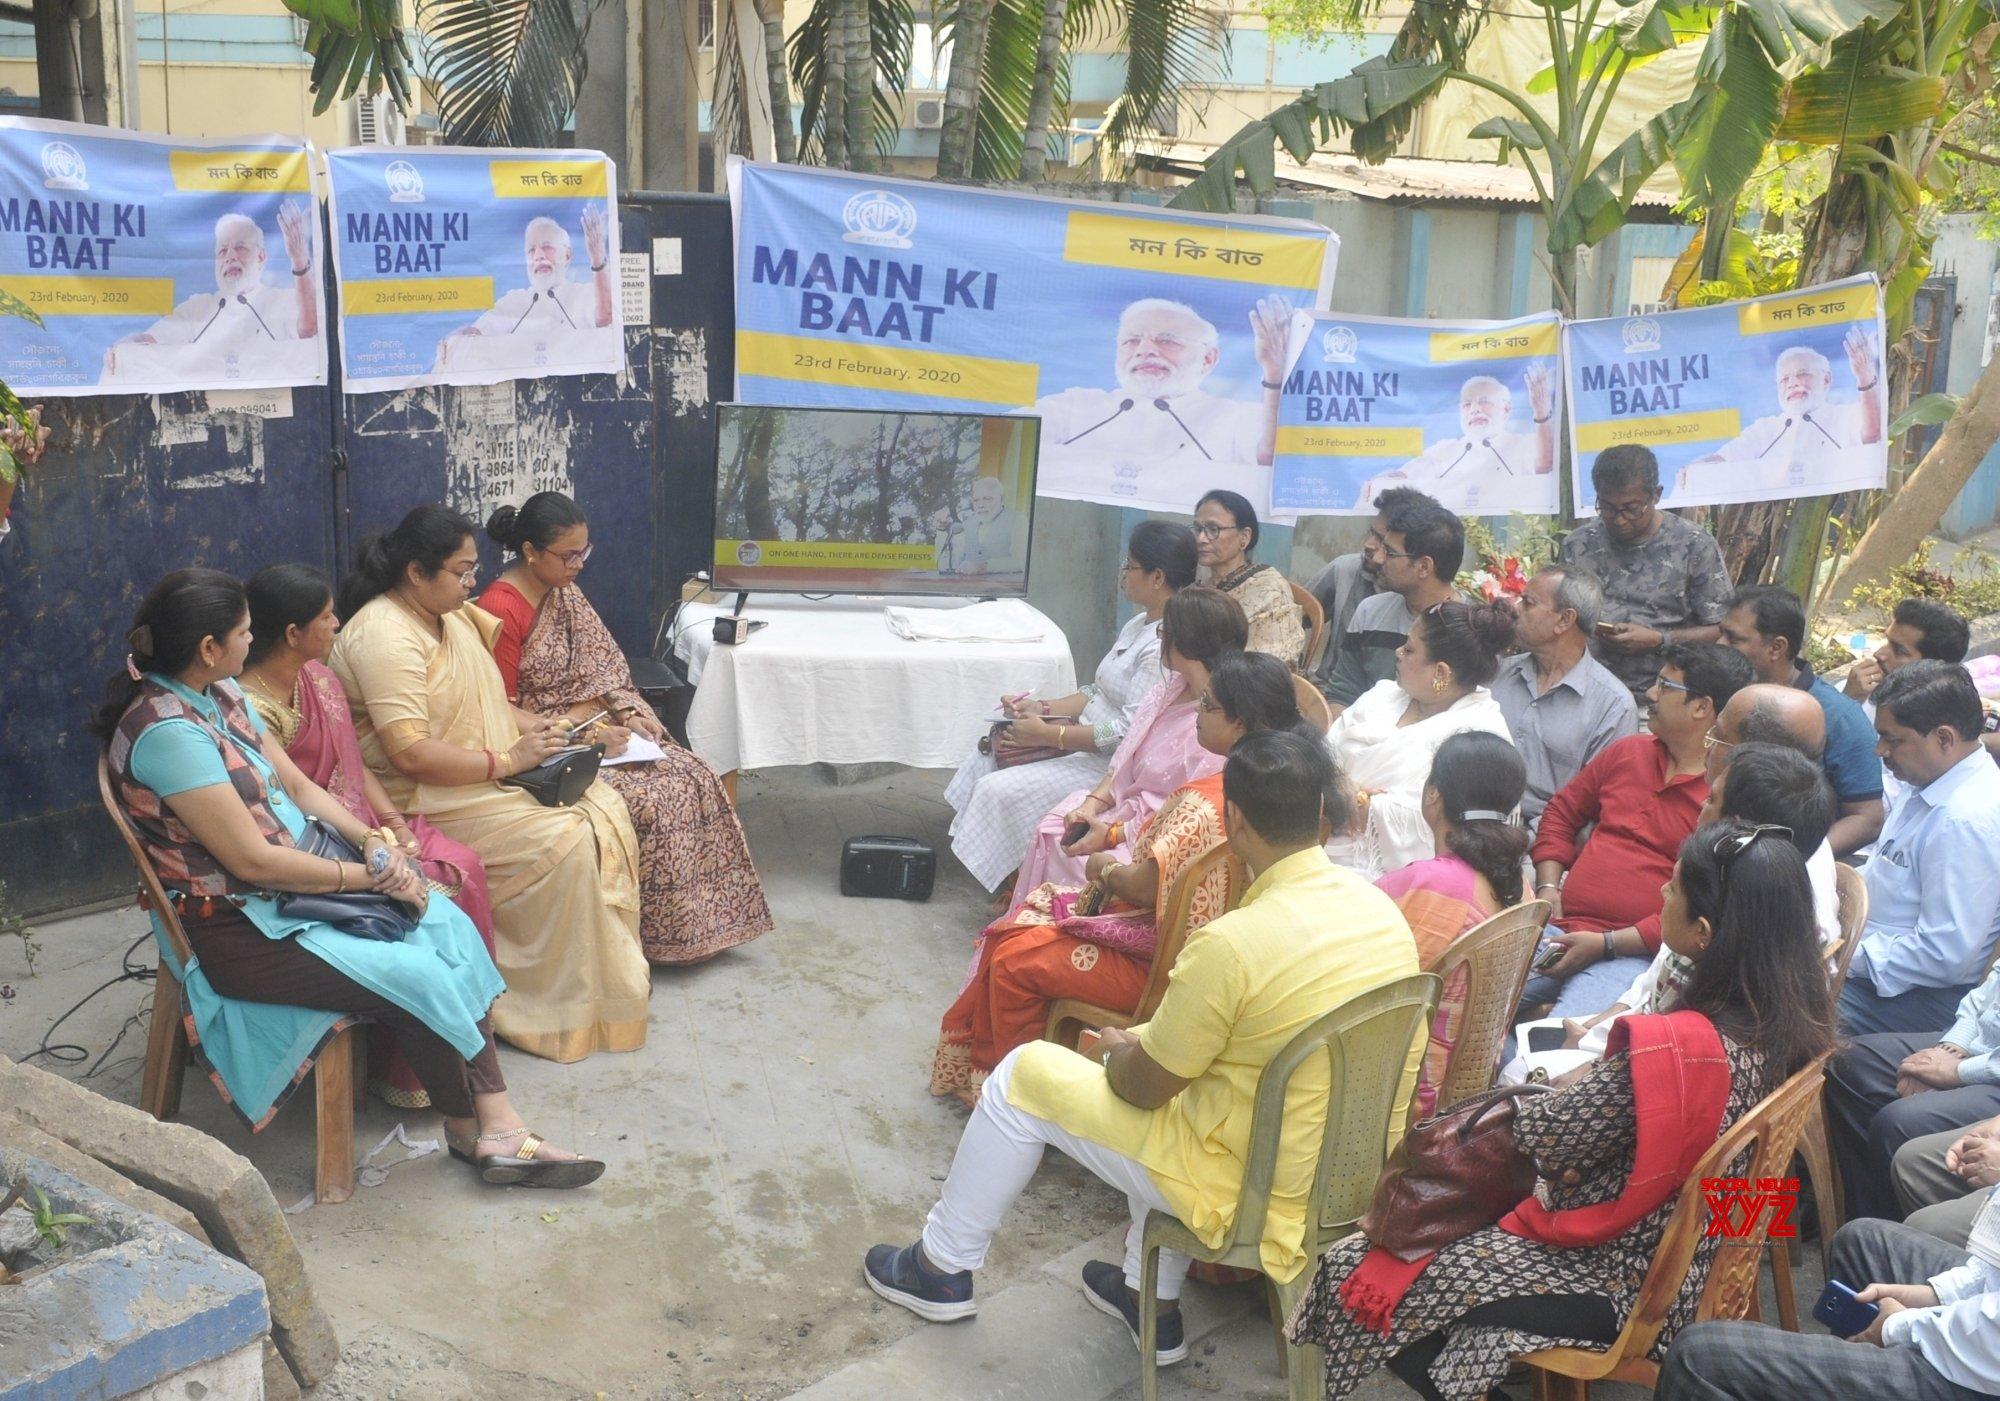 Kolkata: People watch PM Modi's 'Mann Ki Baat' broadcast #Gallery